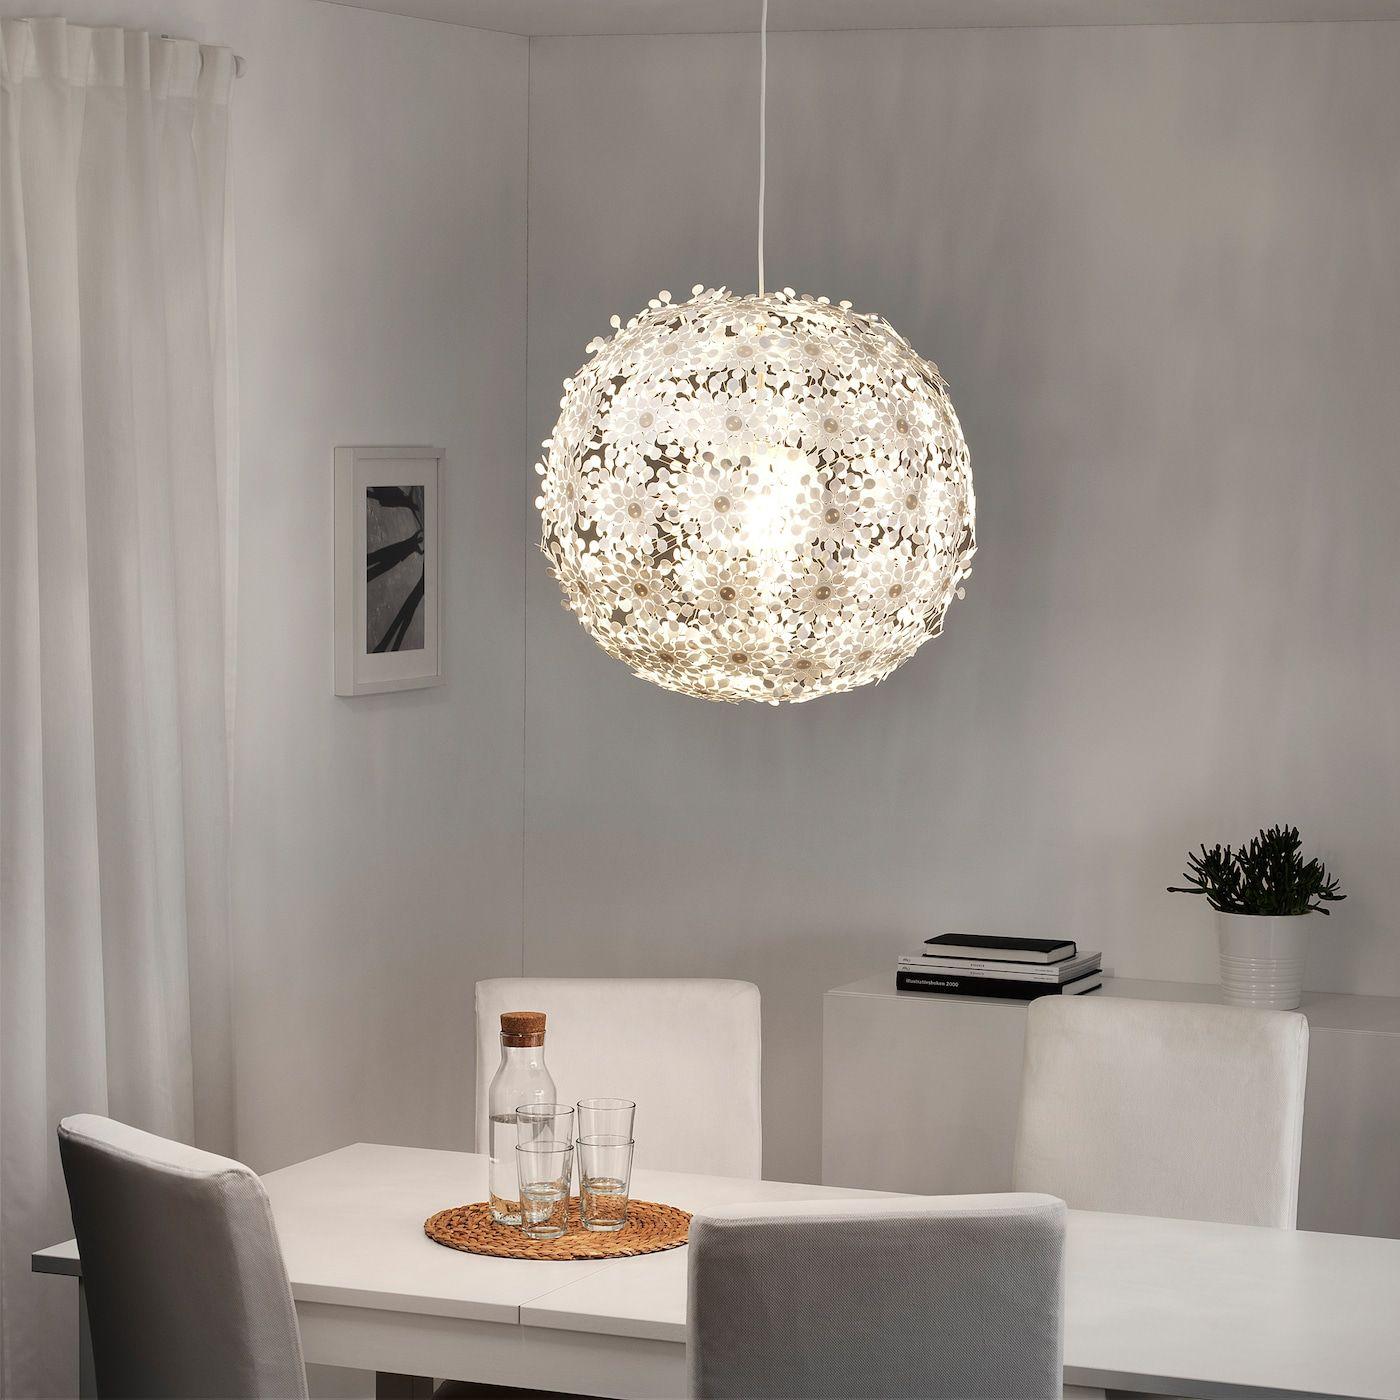 Ikea Grimsas Pendant Lamp White In 2020 Pendant Lamp Ikea